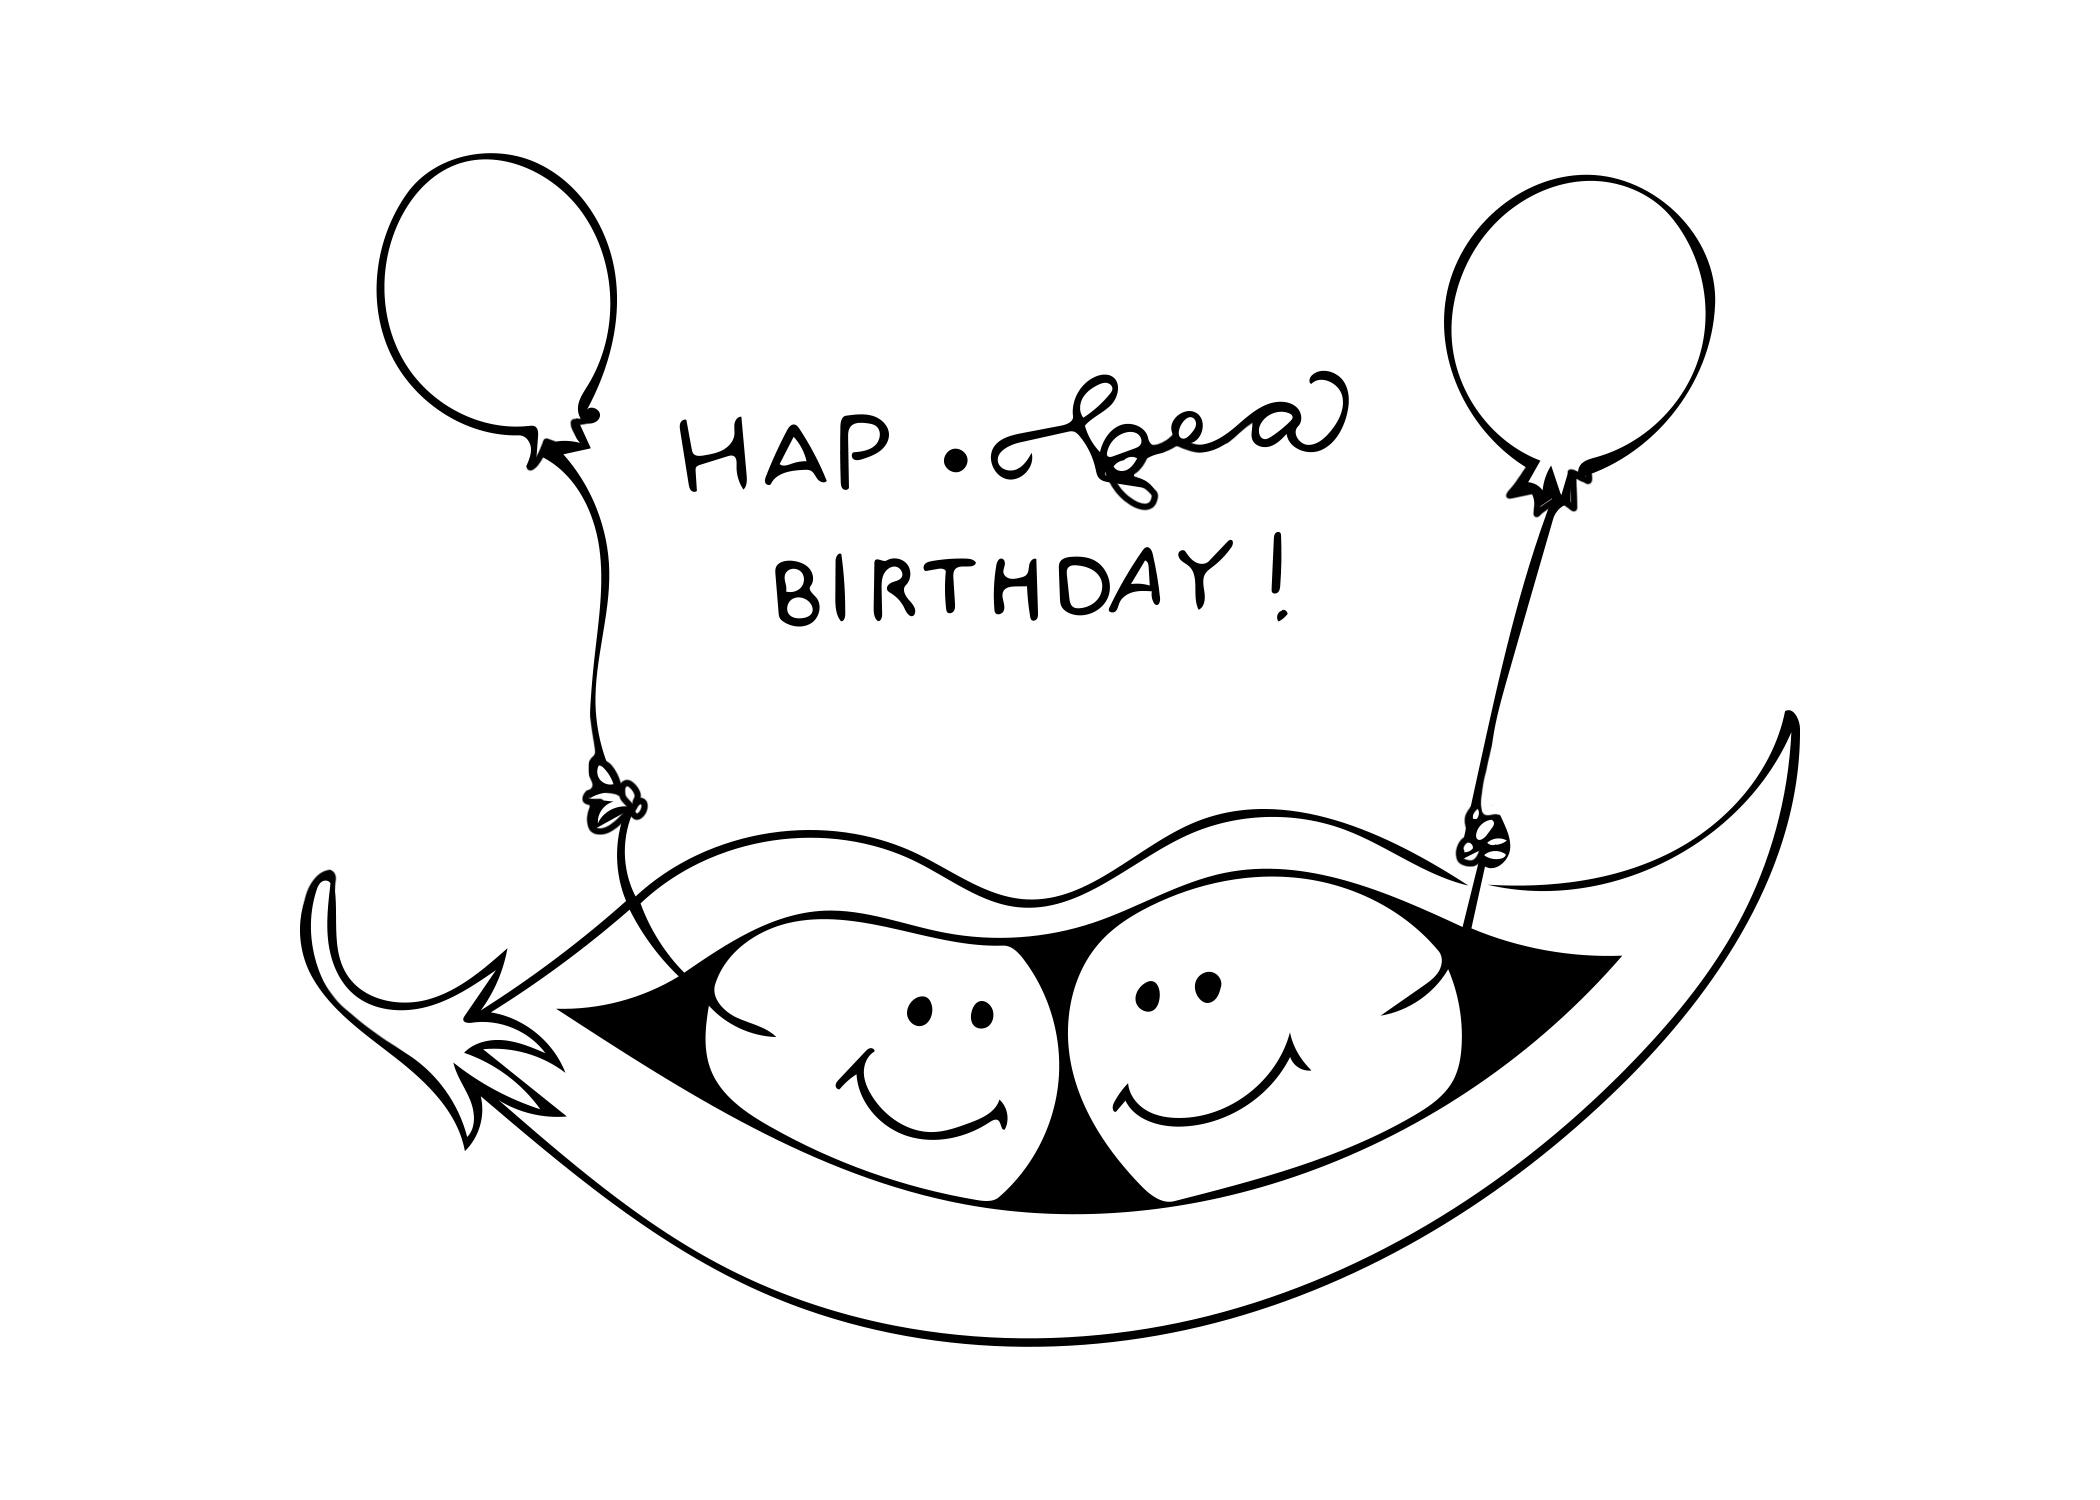 Hap-Pea Birthday.jpg